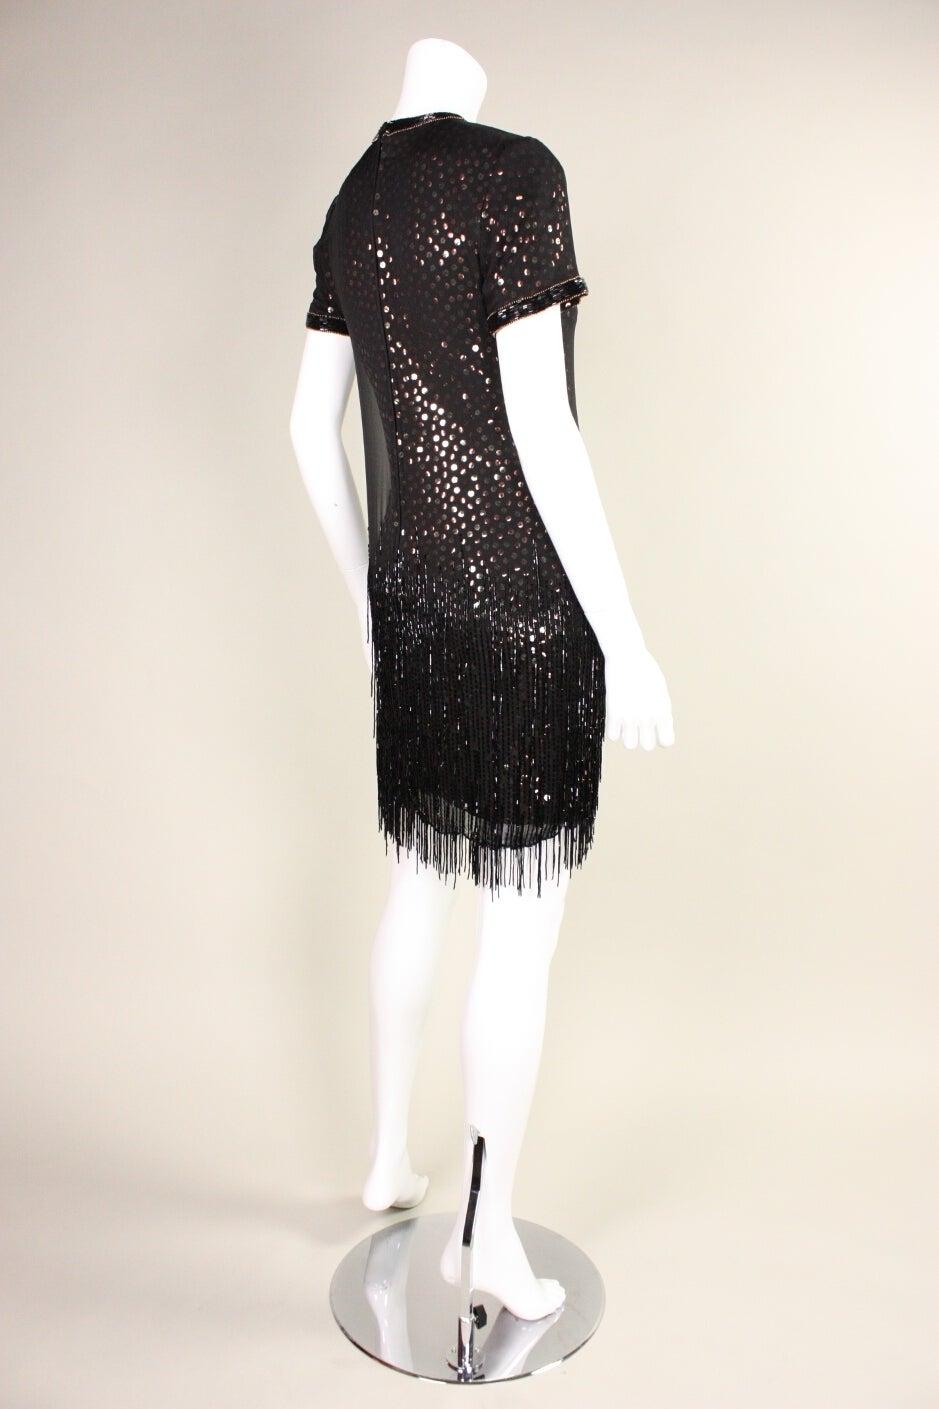 1980s Bob Mackie Sequined Dress with Beaded Fringe 4